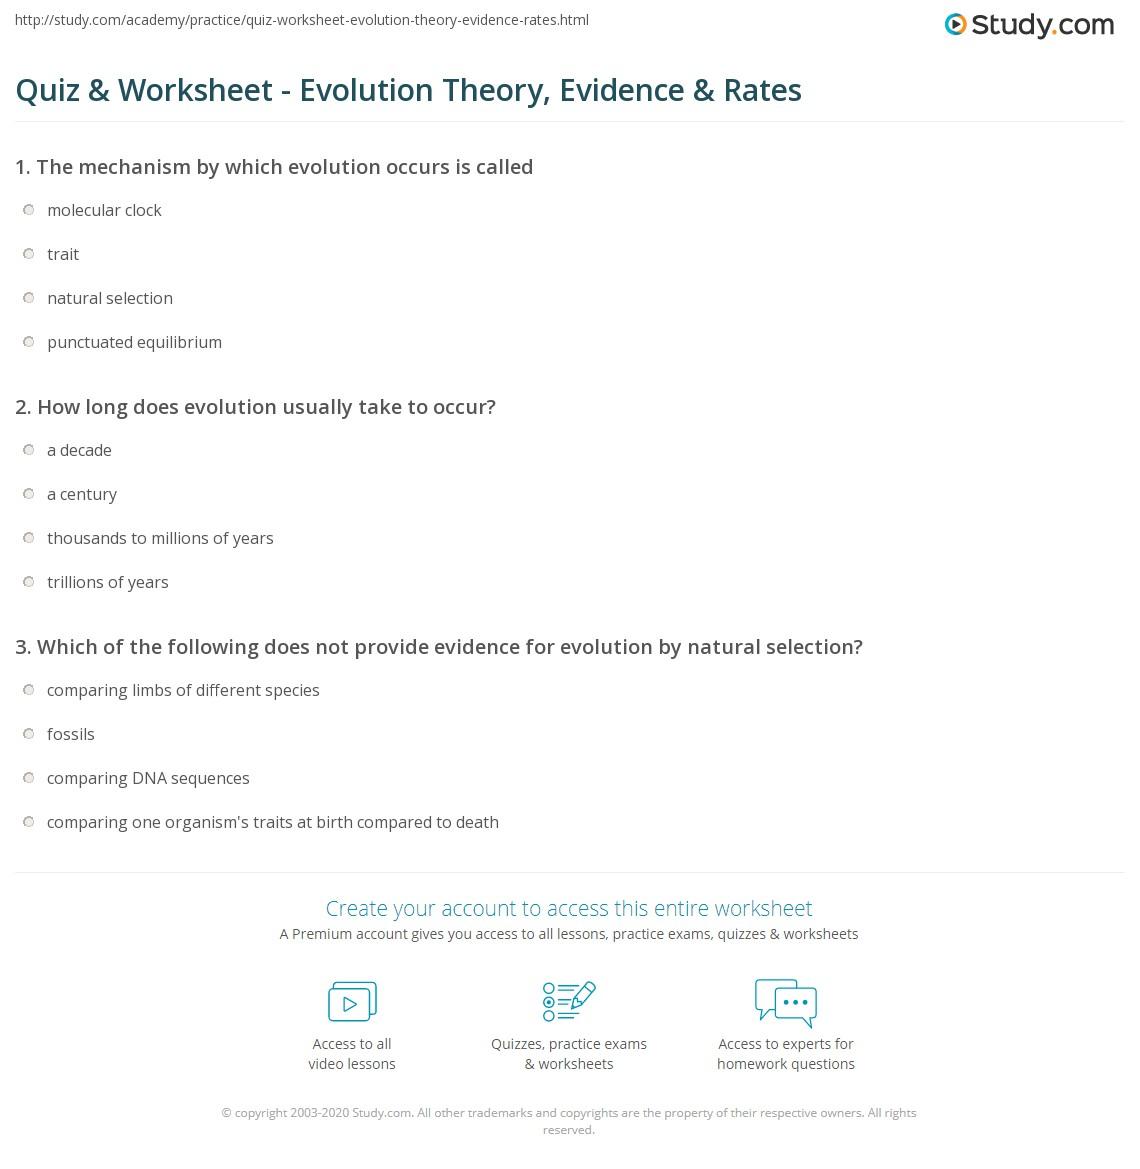 Quiz & Worksheet - Evolution Theory, Evidence & Rates   Study.com